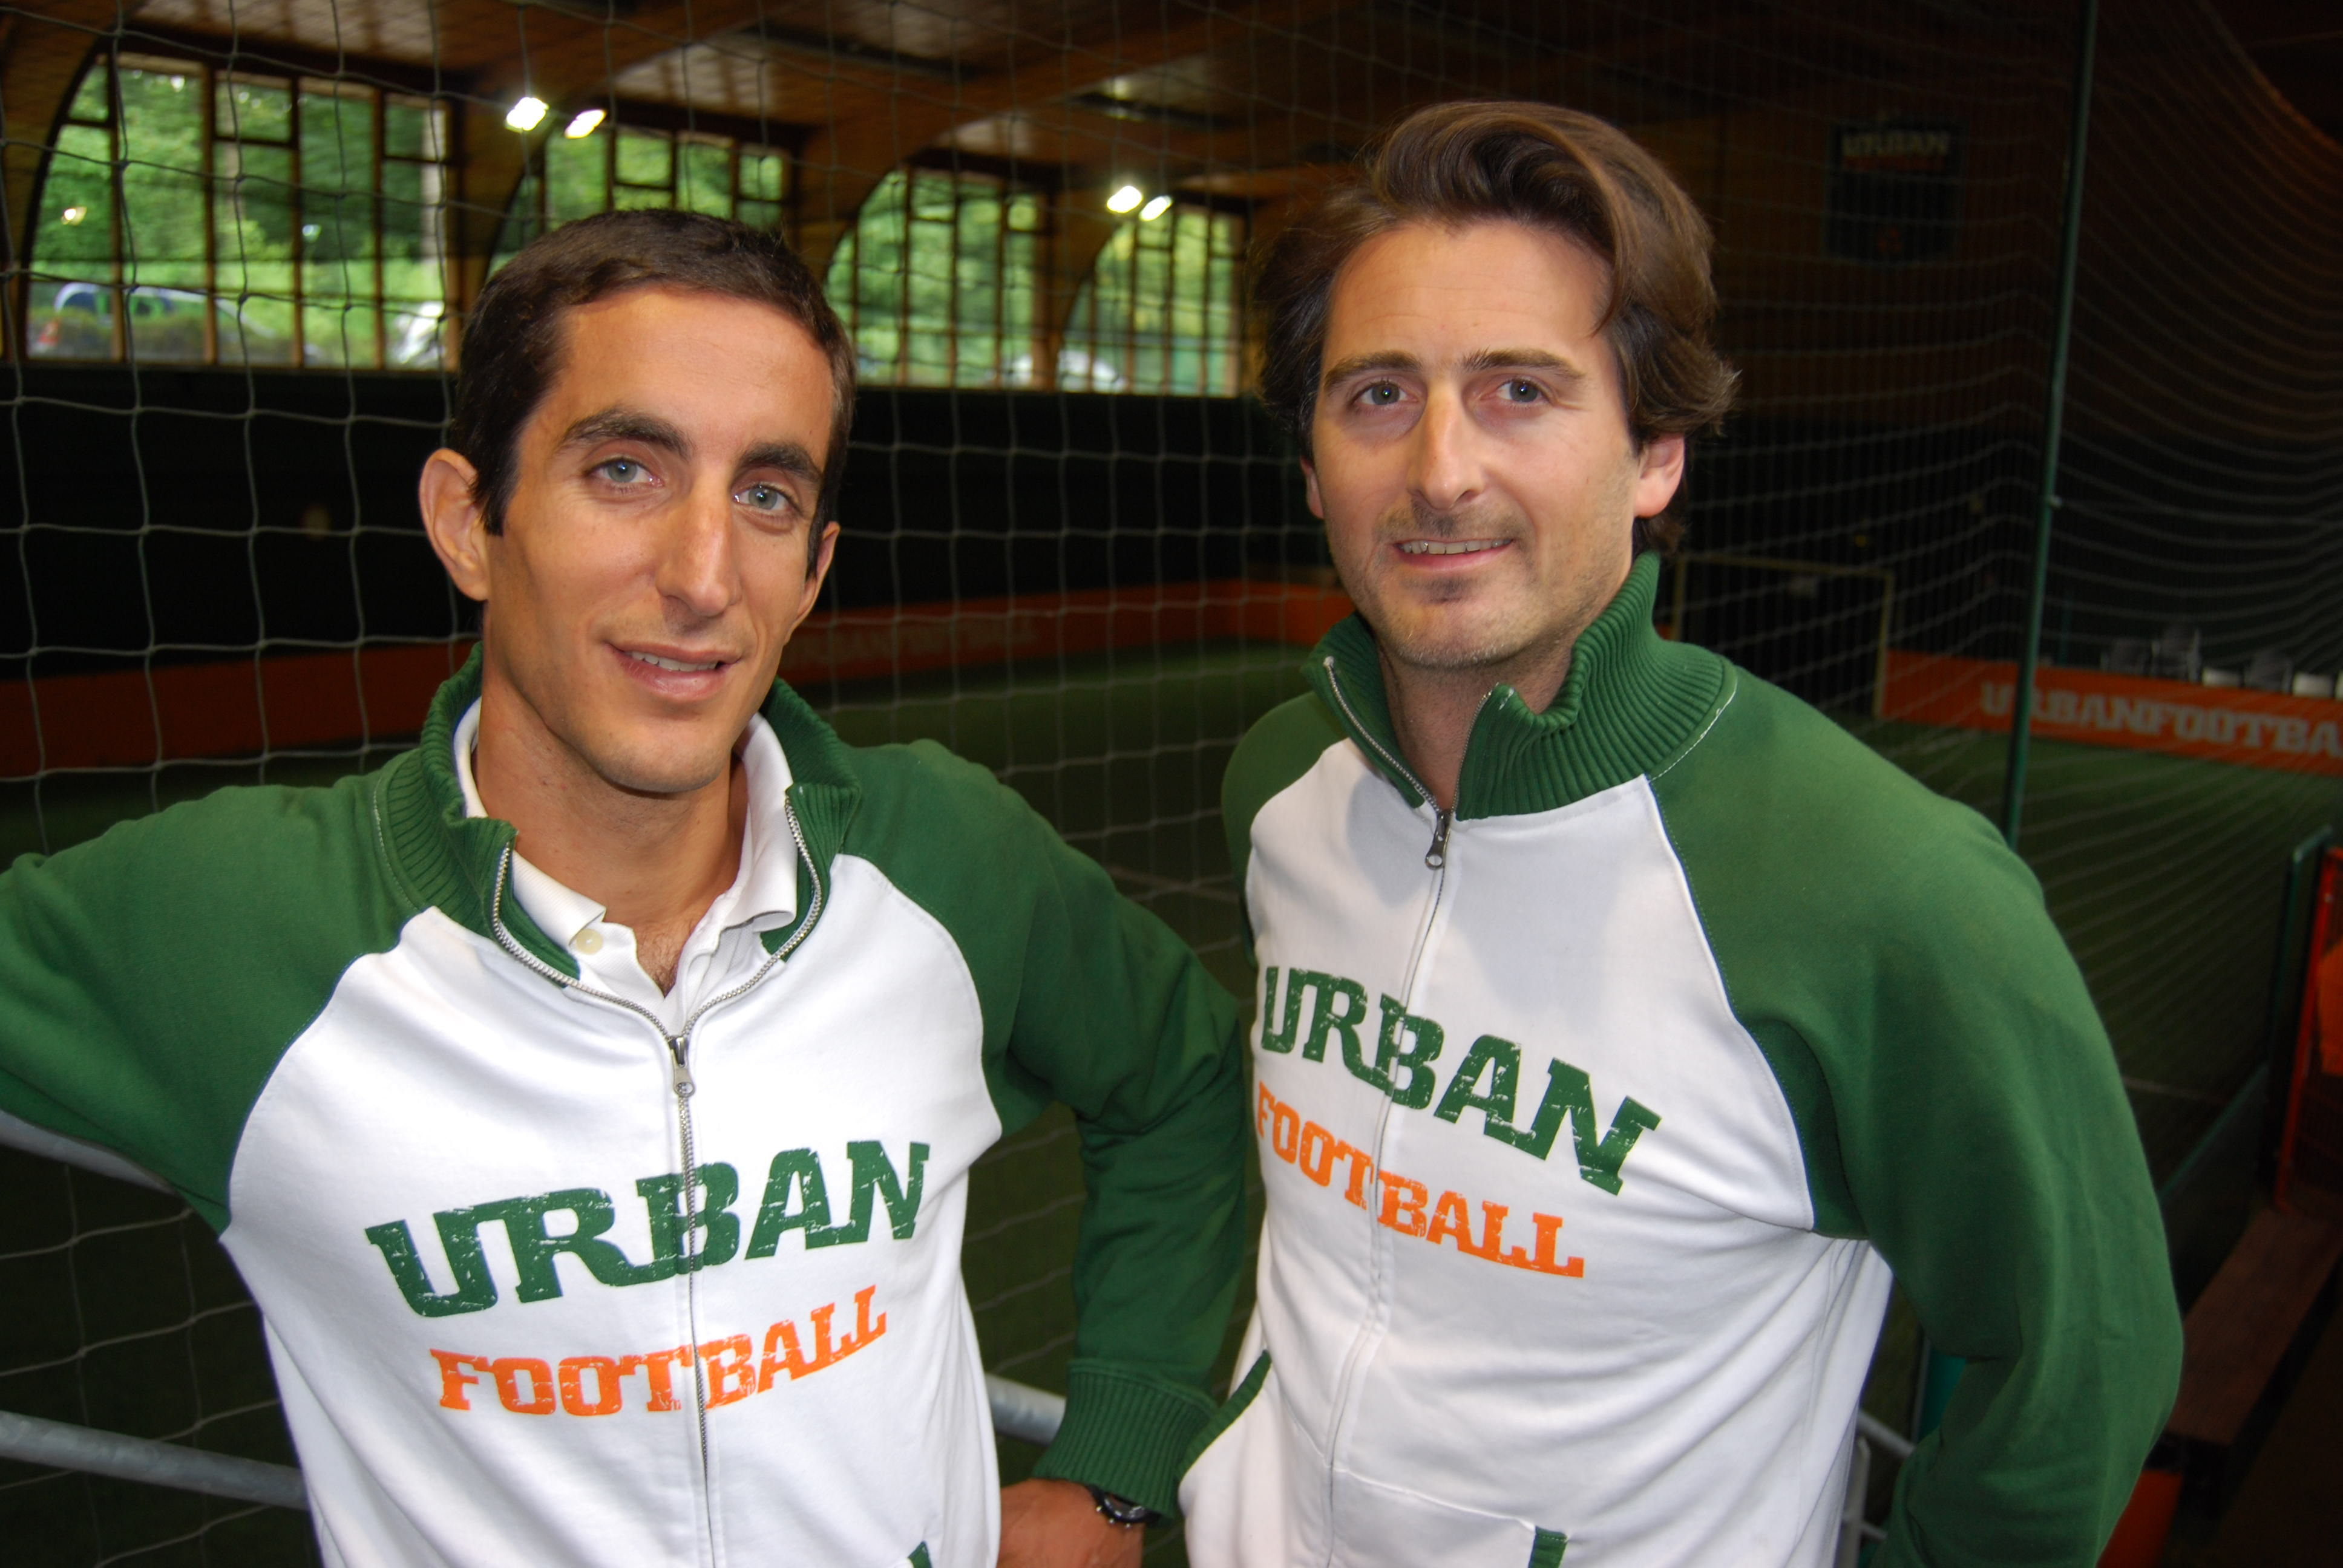 icolas Warter, 36 ans, et Victor Augais, 35 ans, codirigeants d'UrbanFootball